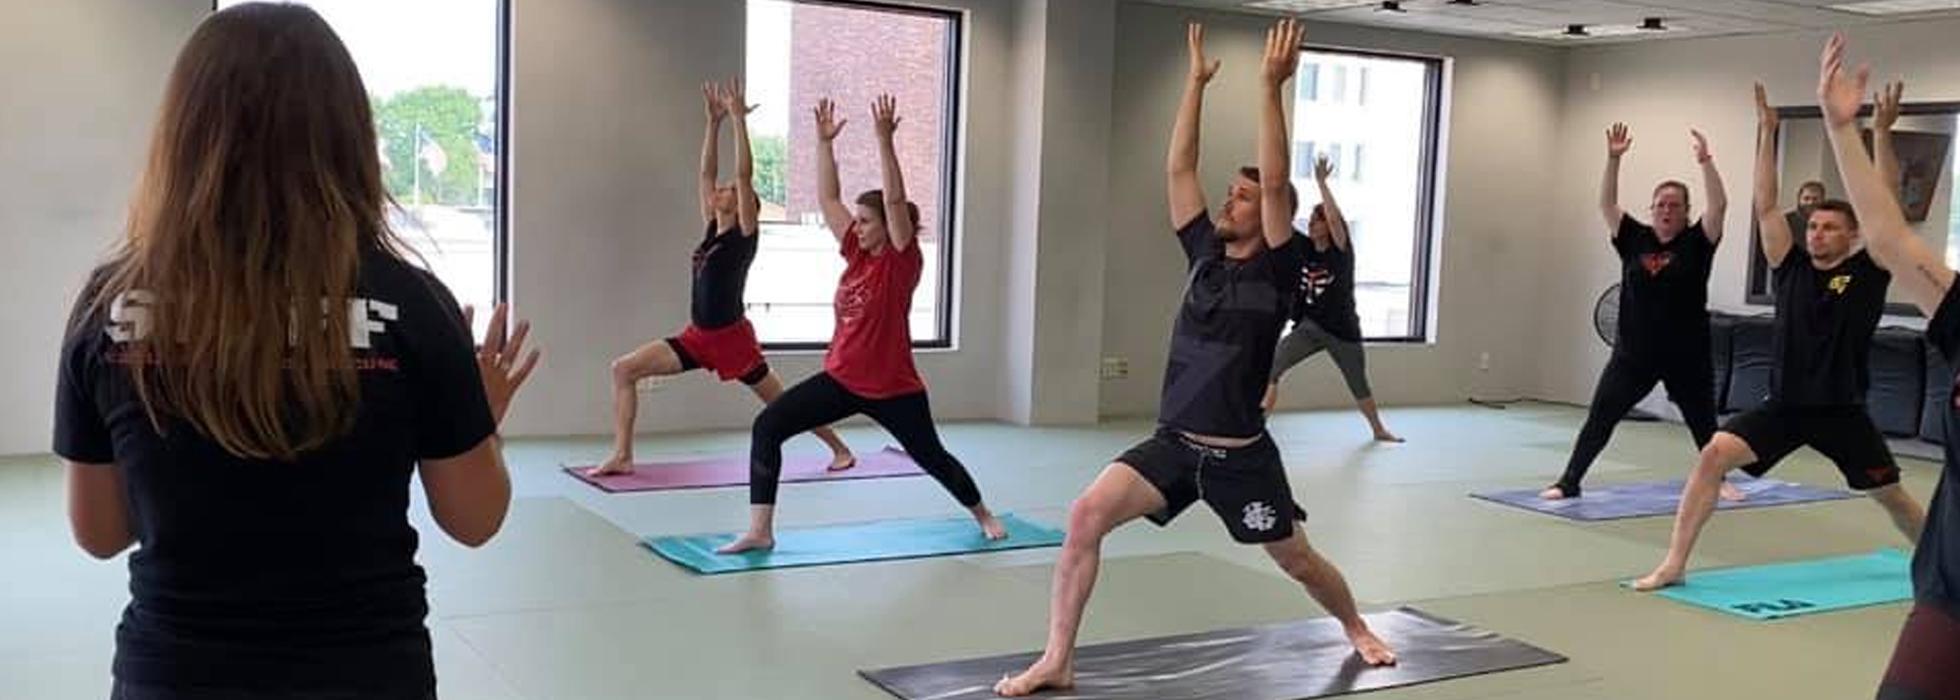 Yoga Classes in Neenah WI, Yoga Classes near Fox Valley WI, Yoga Classes near Fox Cities WI, Yoga Classes near Menasha WI, Yoga Classes near Green Bay WI, Yoga Classes near Appleton WI, Yoga Classes near Oshkosh WI